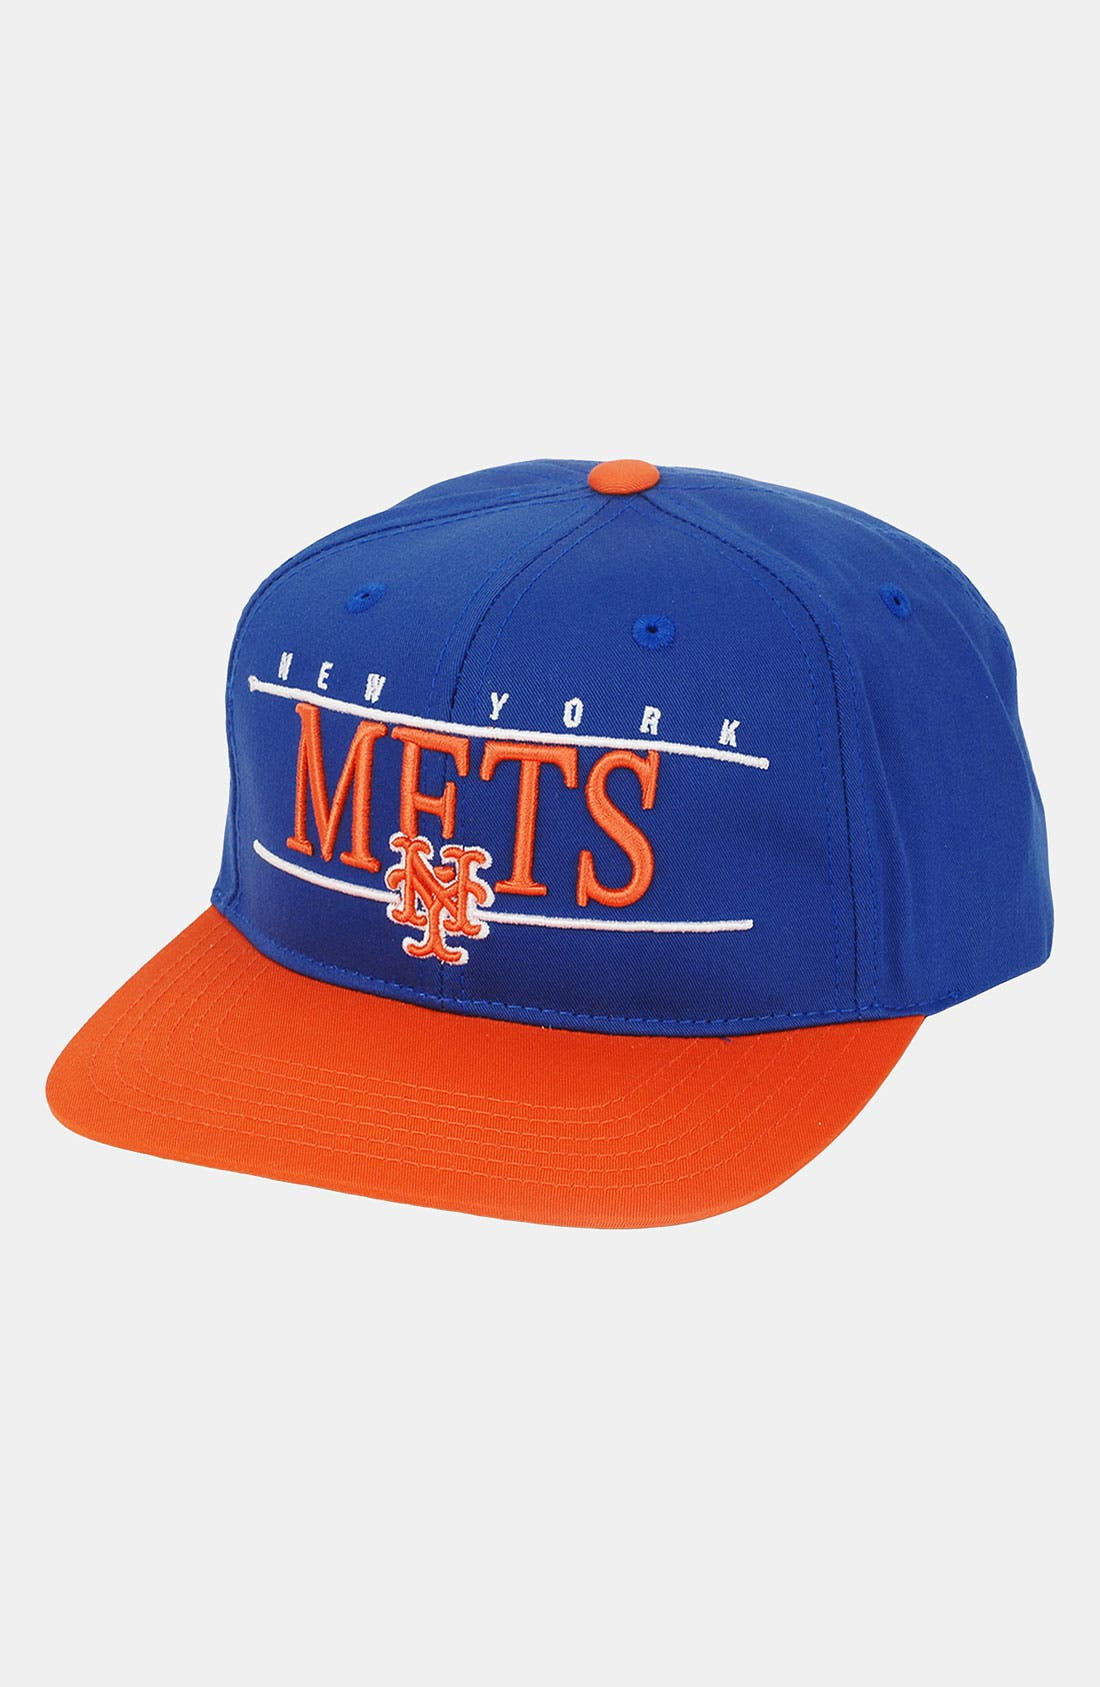 Main Image - American Needle 'New York Mets - Nineties' Twill Snapback Baseball Cap